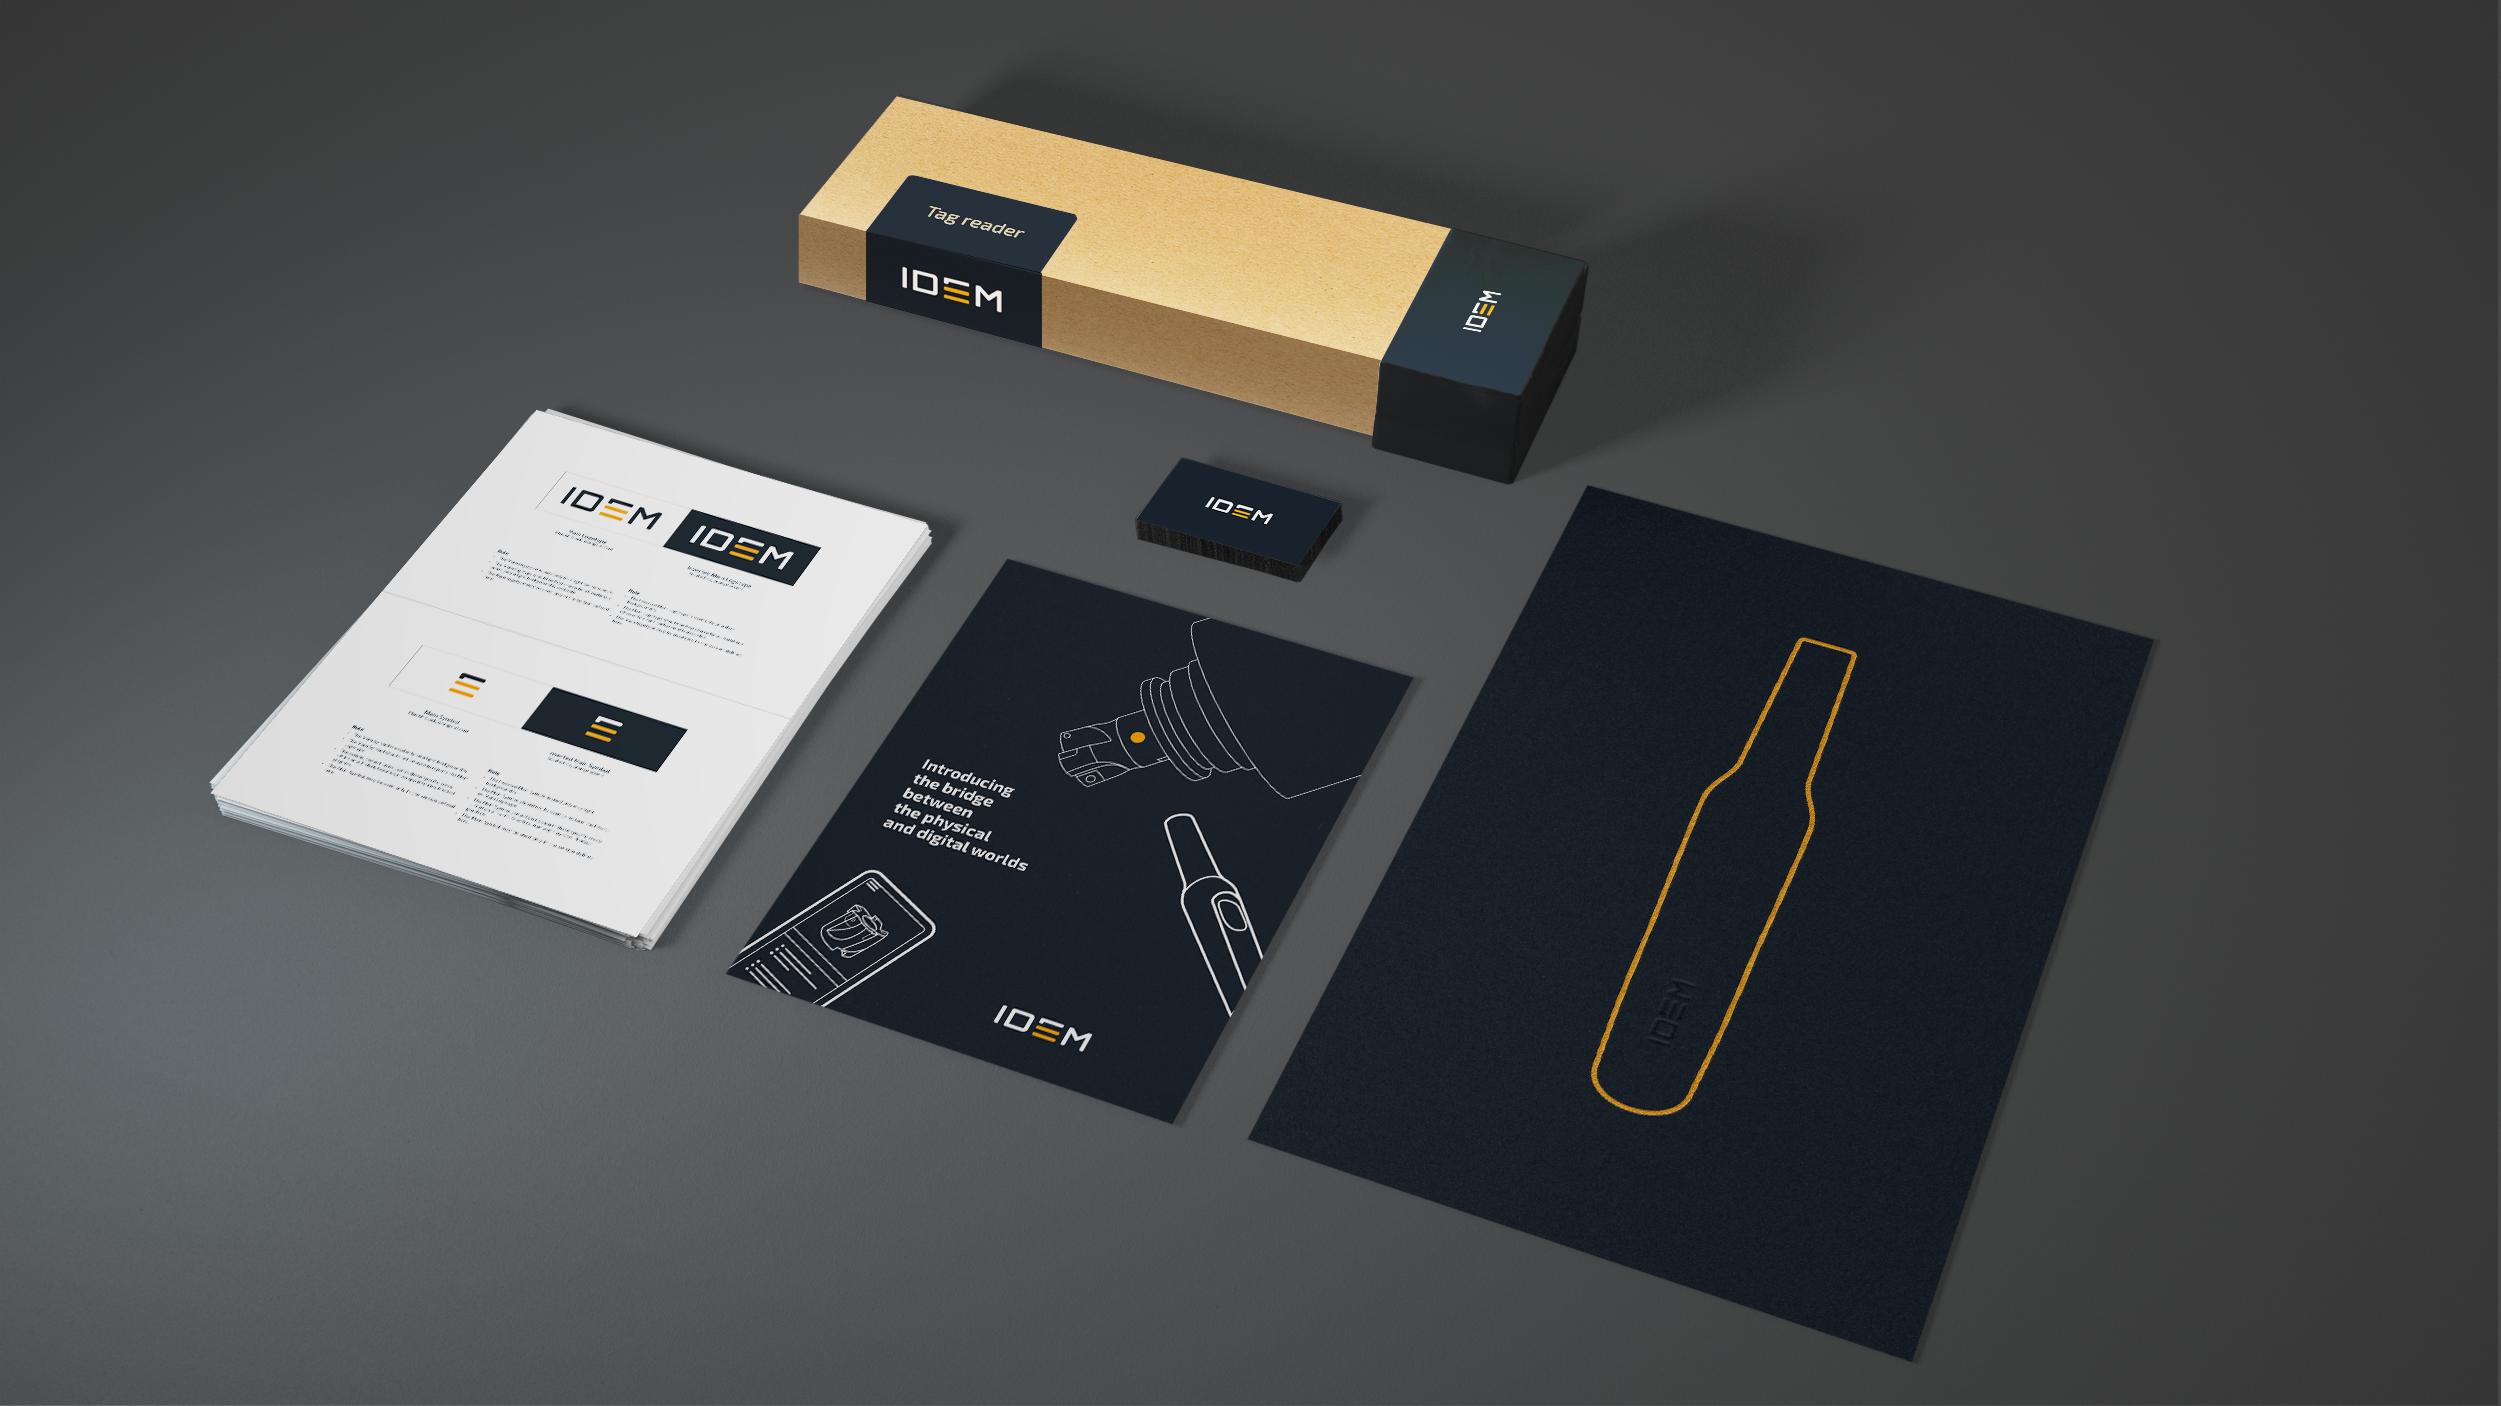 IDEM  Brand works Collage